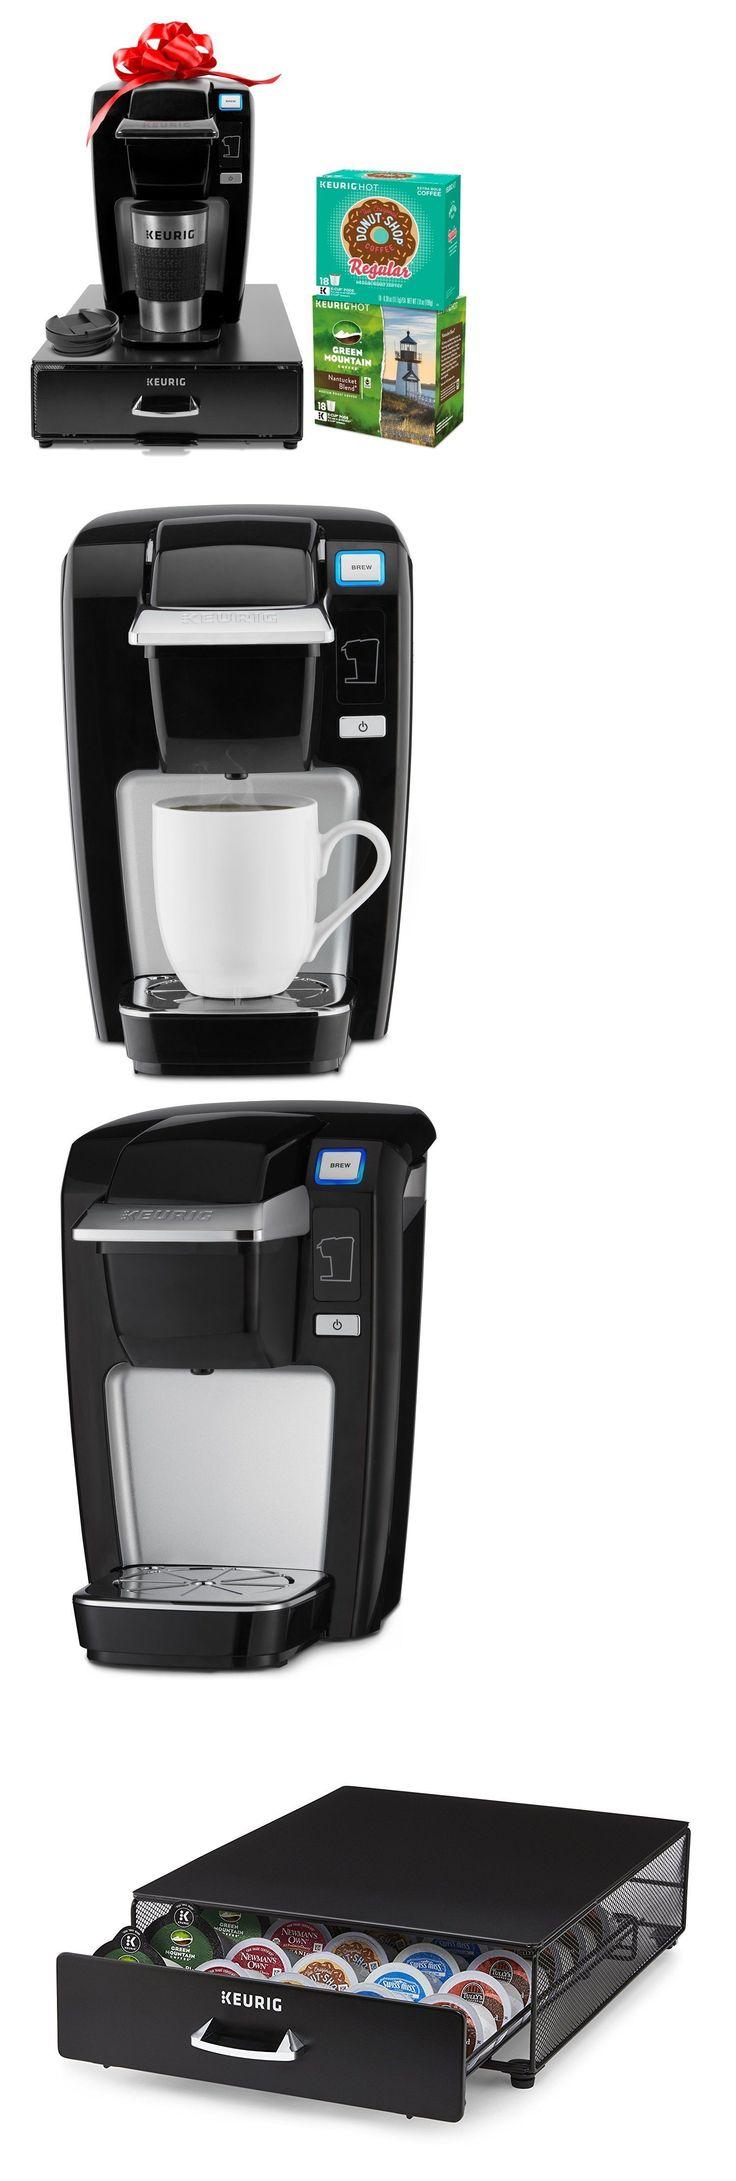 Single Serve Brewers 156775: New! Keurig K15 Single Serve Coffee Maker Bundle With 36 K-Cup Pods, Black -> BUY IT NOW ONLY: $159.95 on eBay!